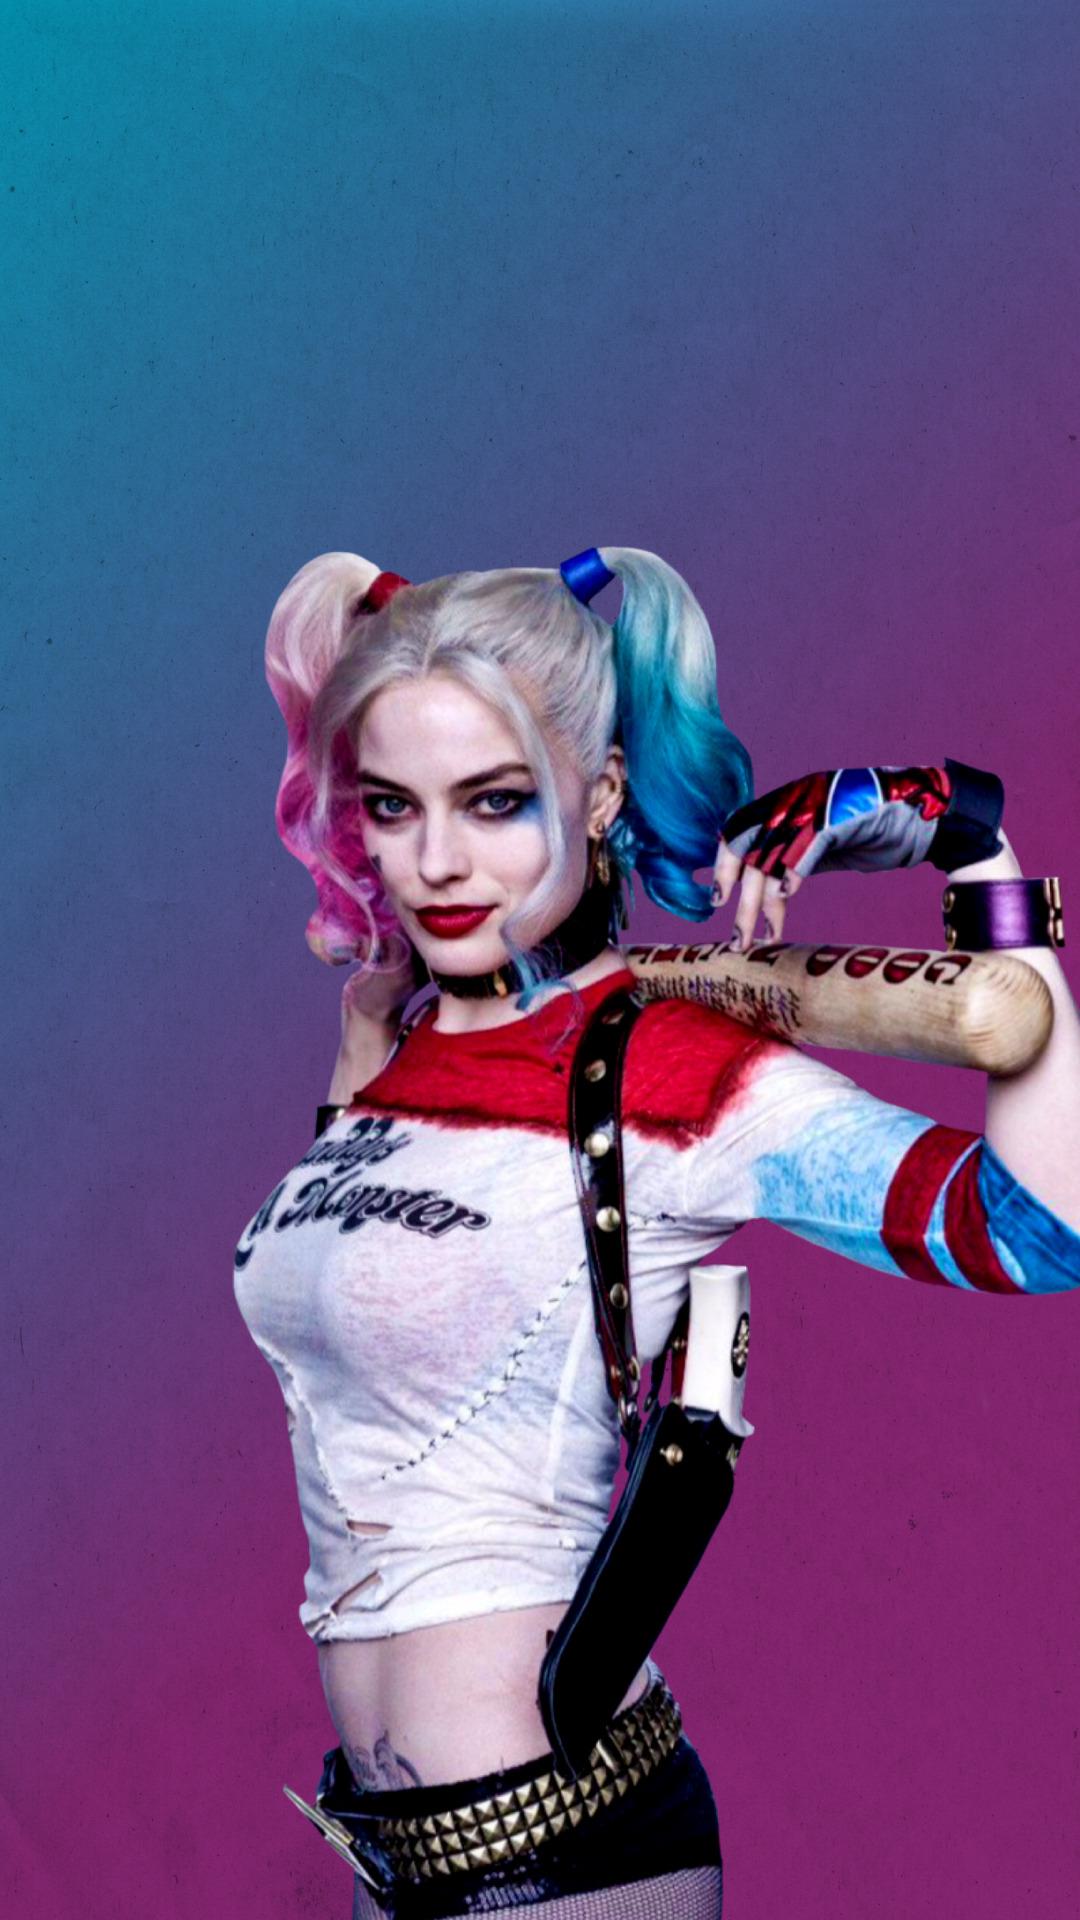 Harley Quinn Lockscreen : harley, quinn, lockscreen, Harley, Quinn, Lockscreen